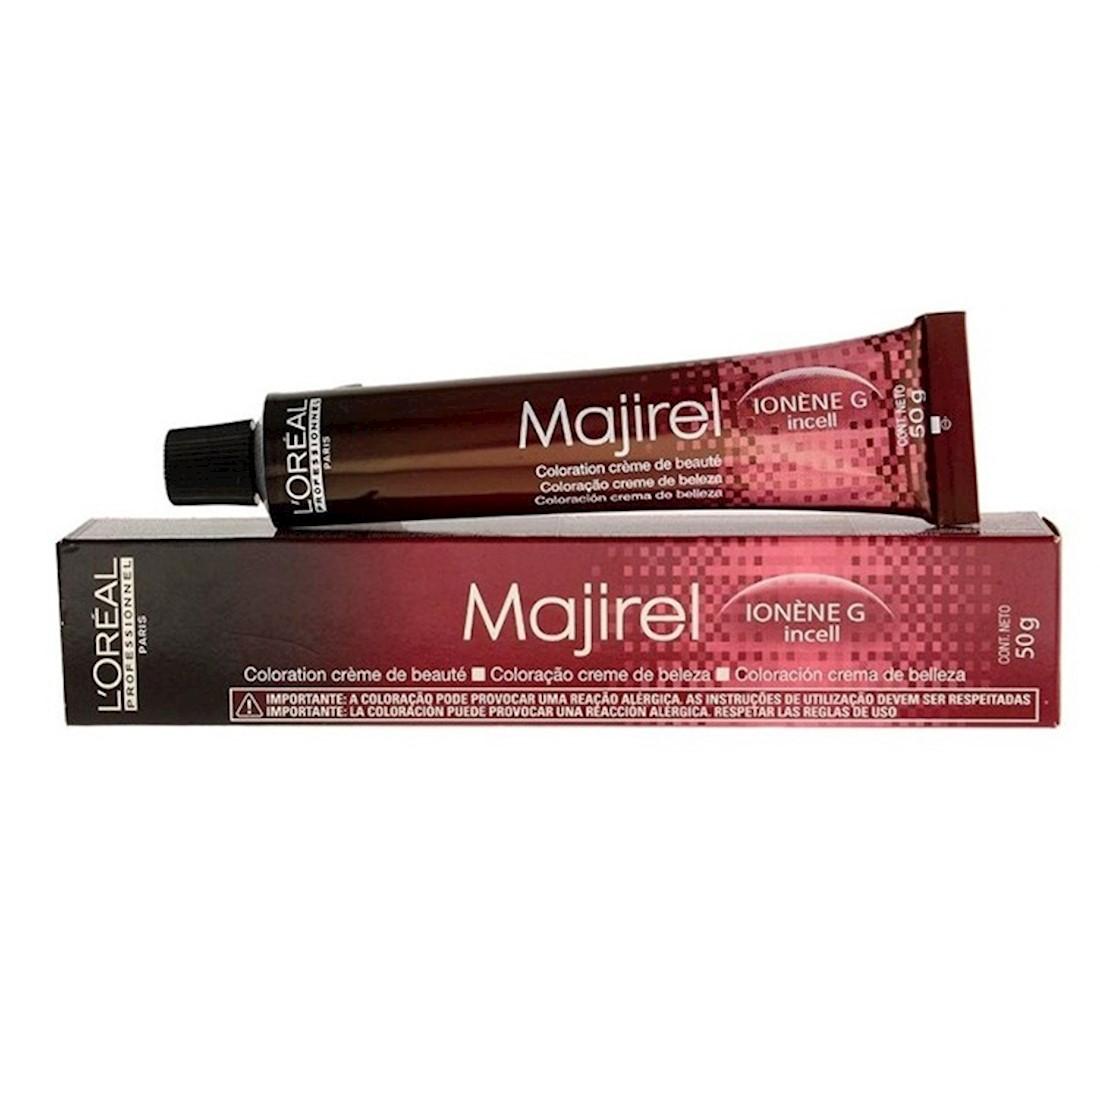 Coloração Majirel 7 (Louro escuro natural) da L'Oreal 50g Bisnaga